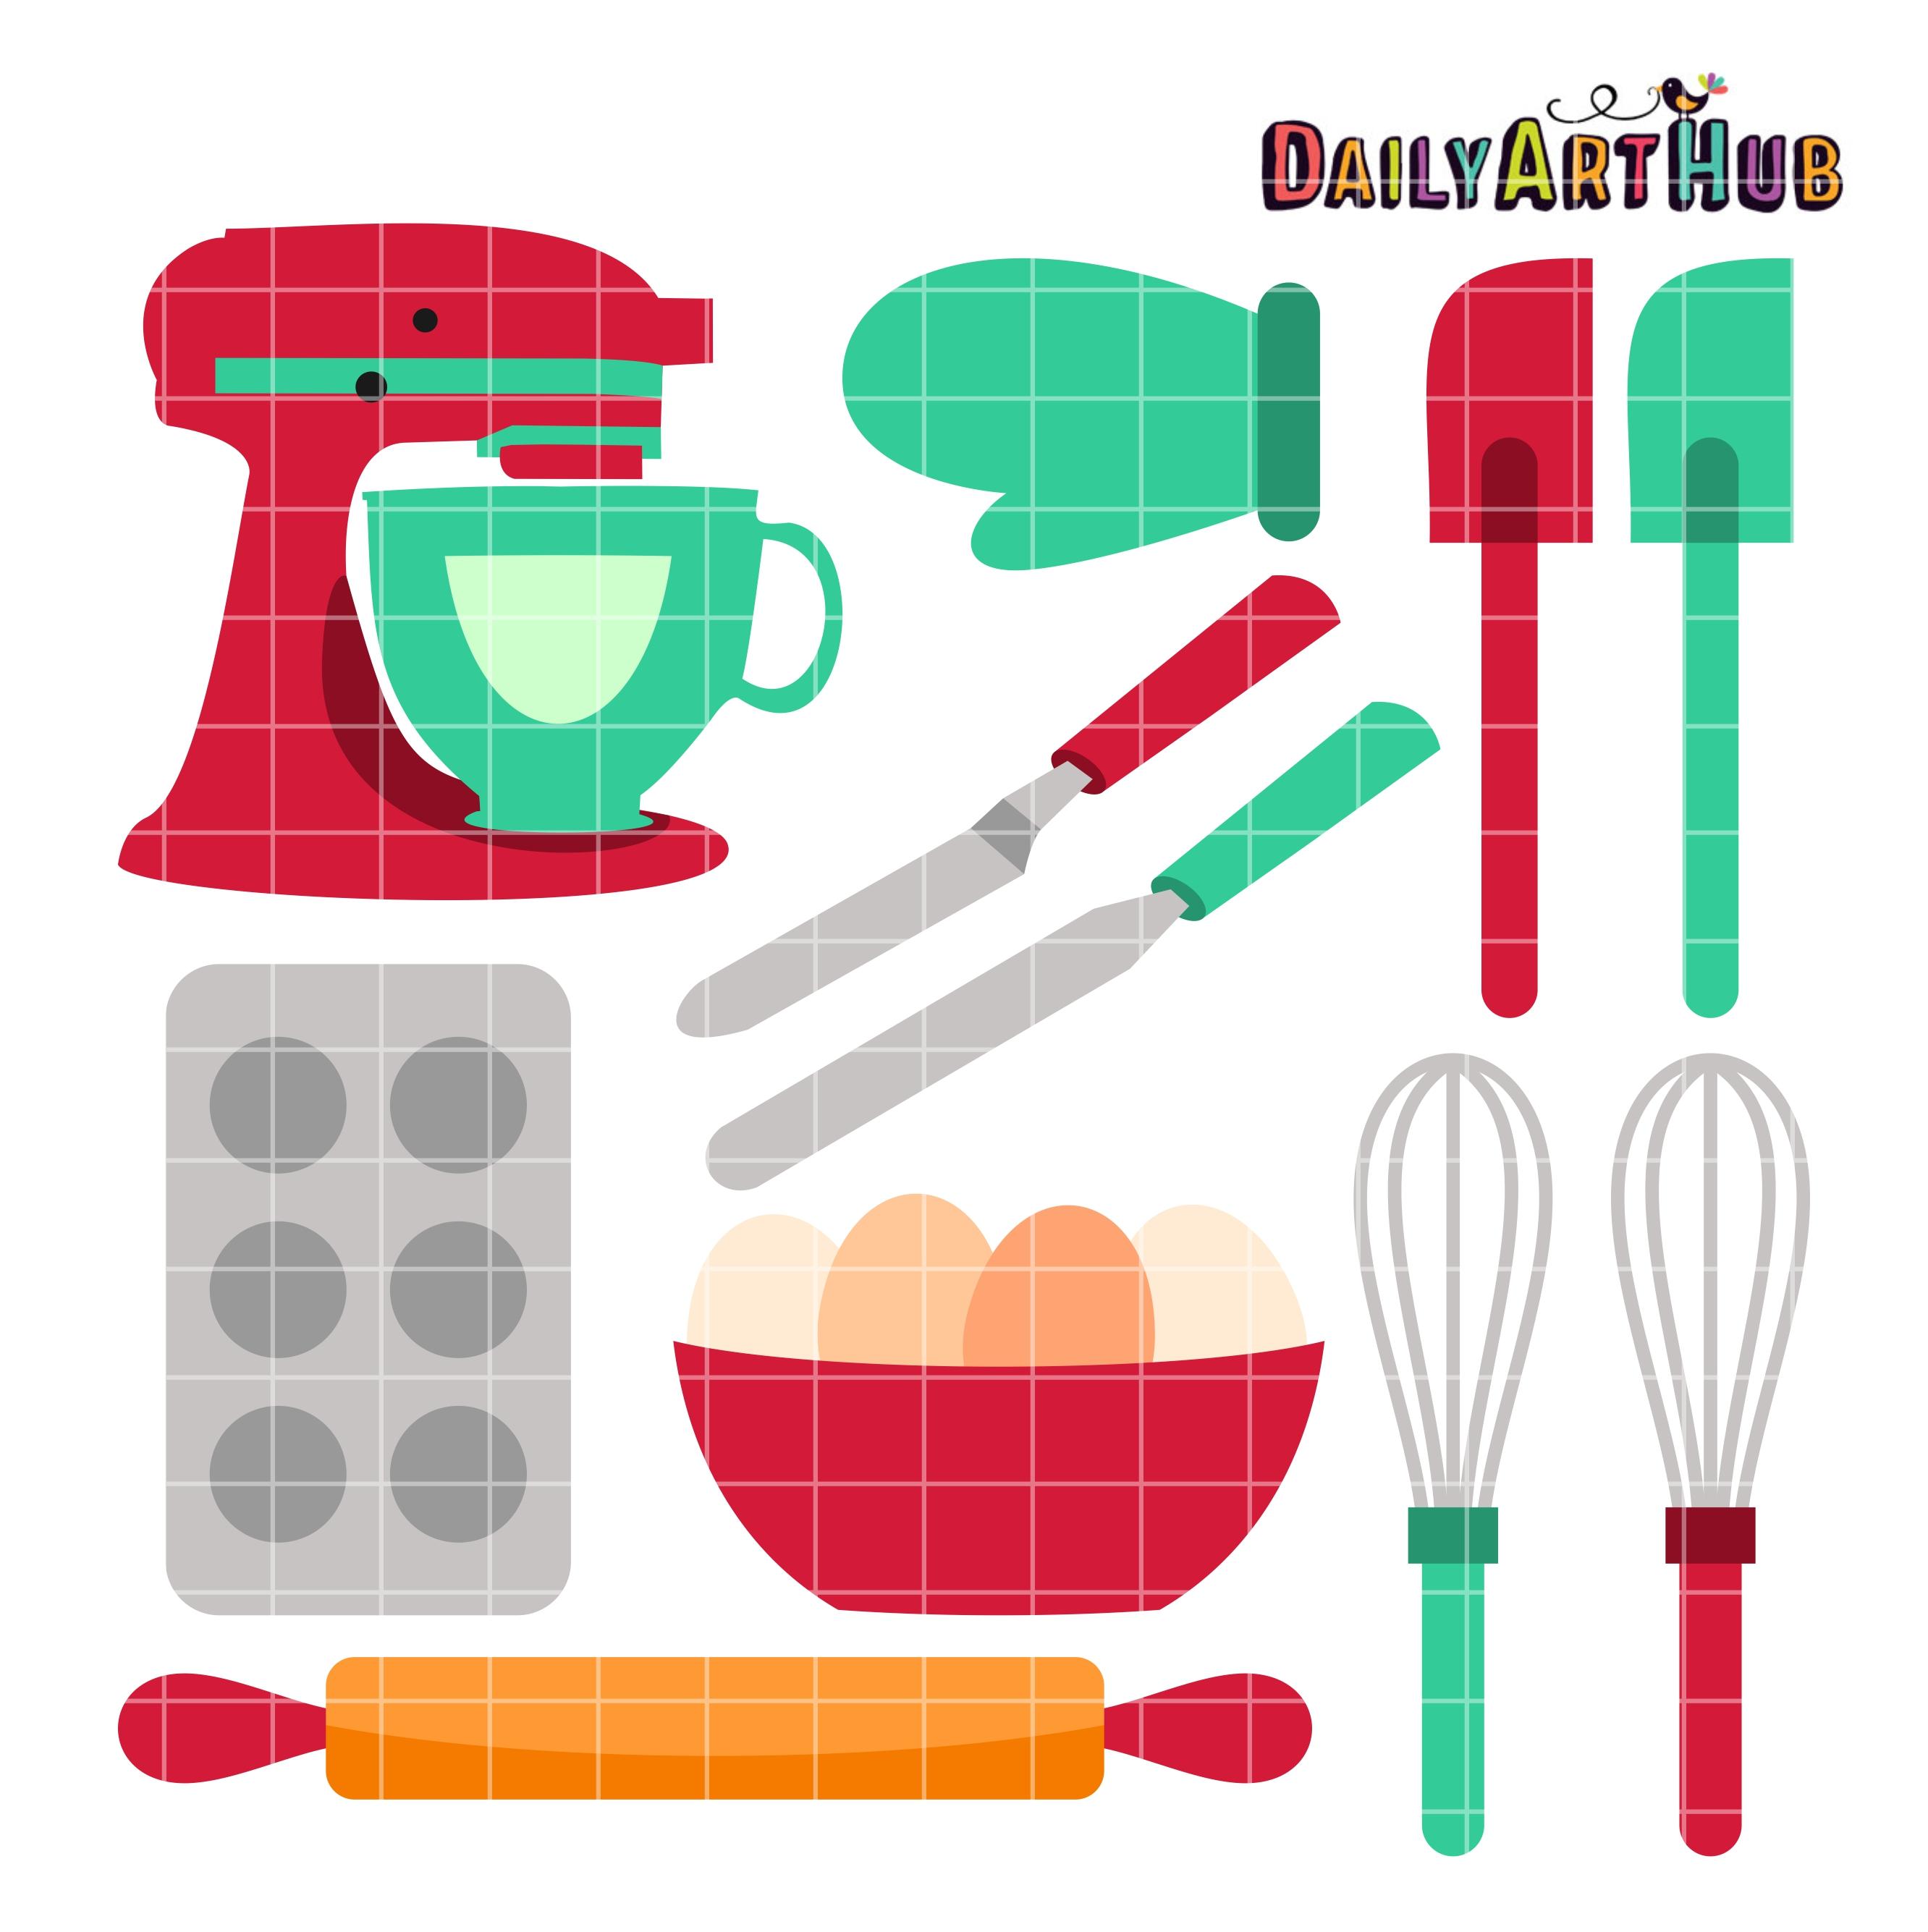 Baking Tools Clip Art Set Daily Art Hub Free Clip Art